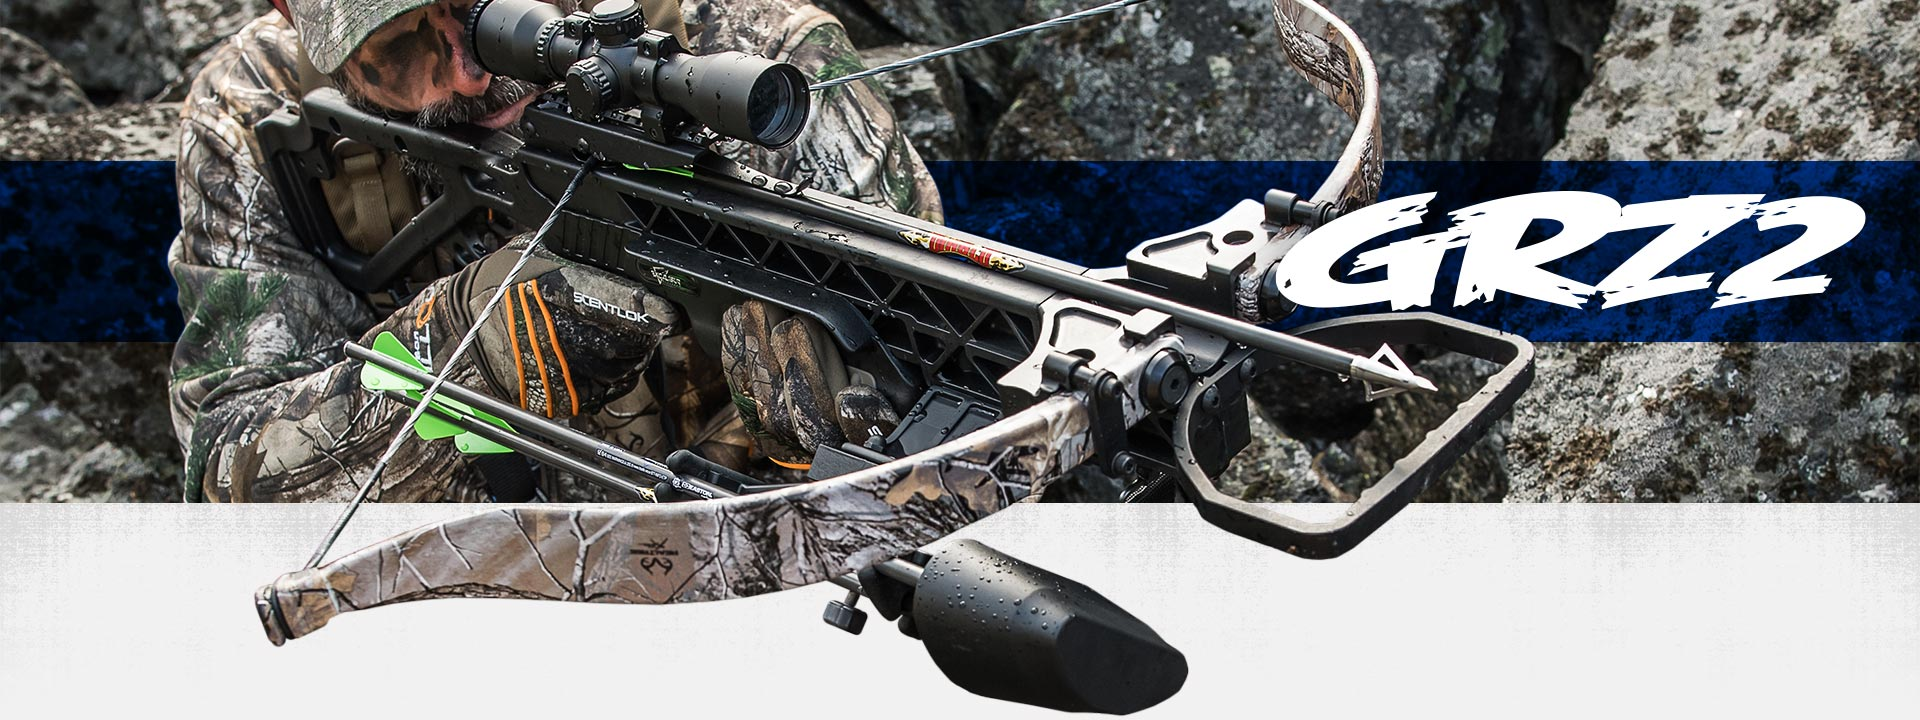 Excalibur GRZ2 crossbow in camo